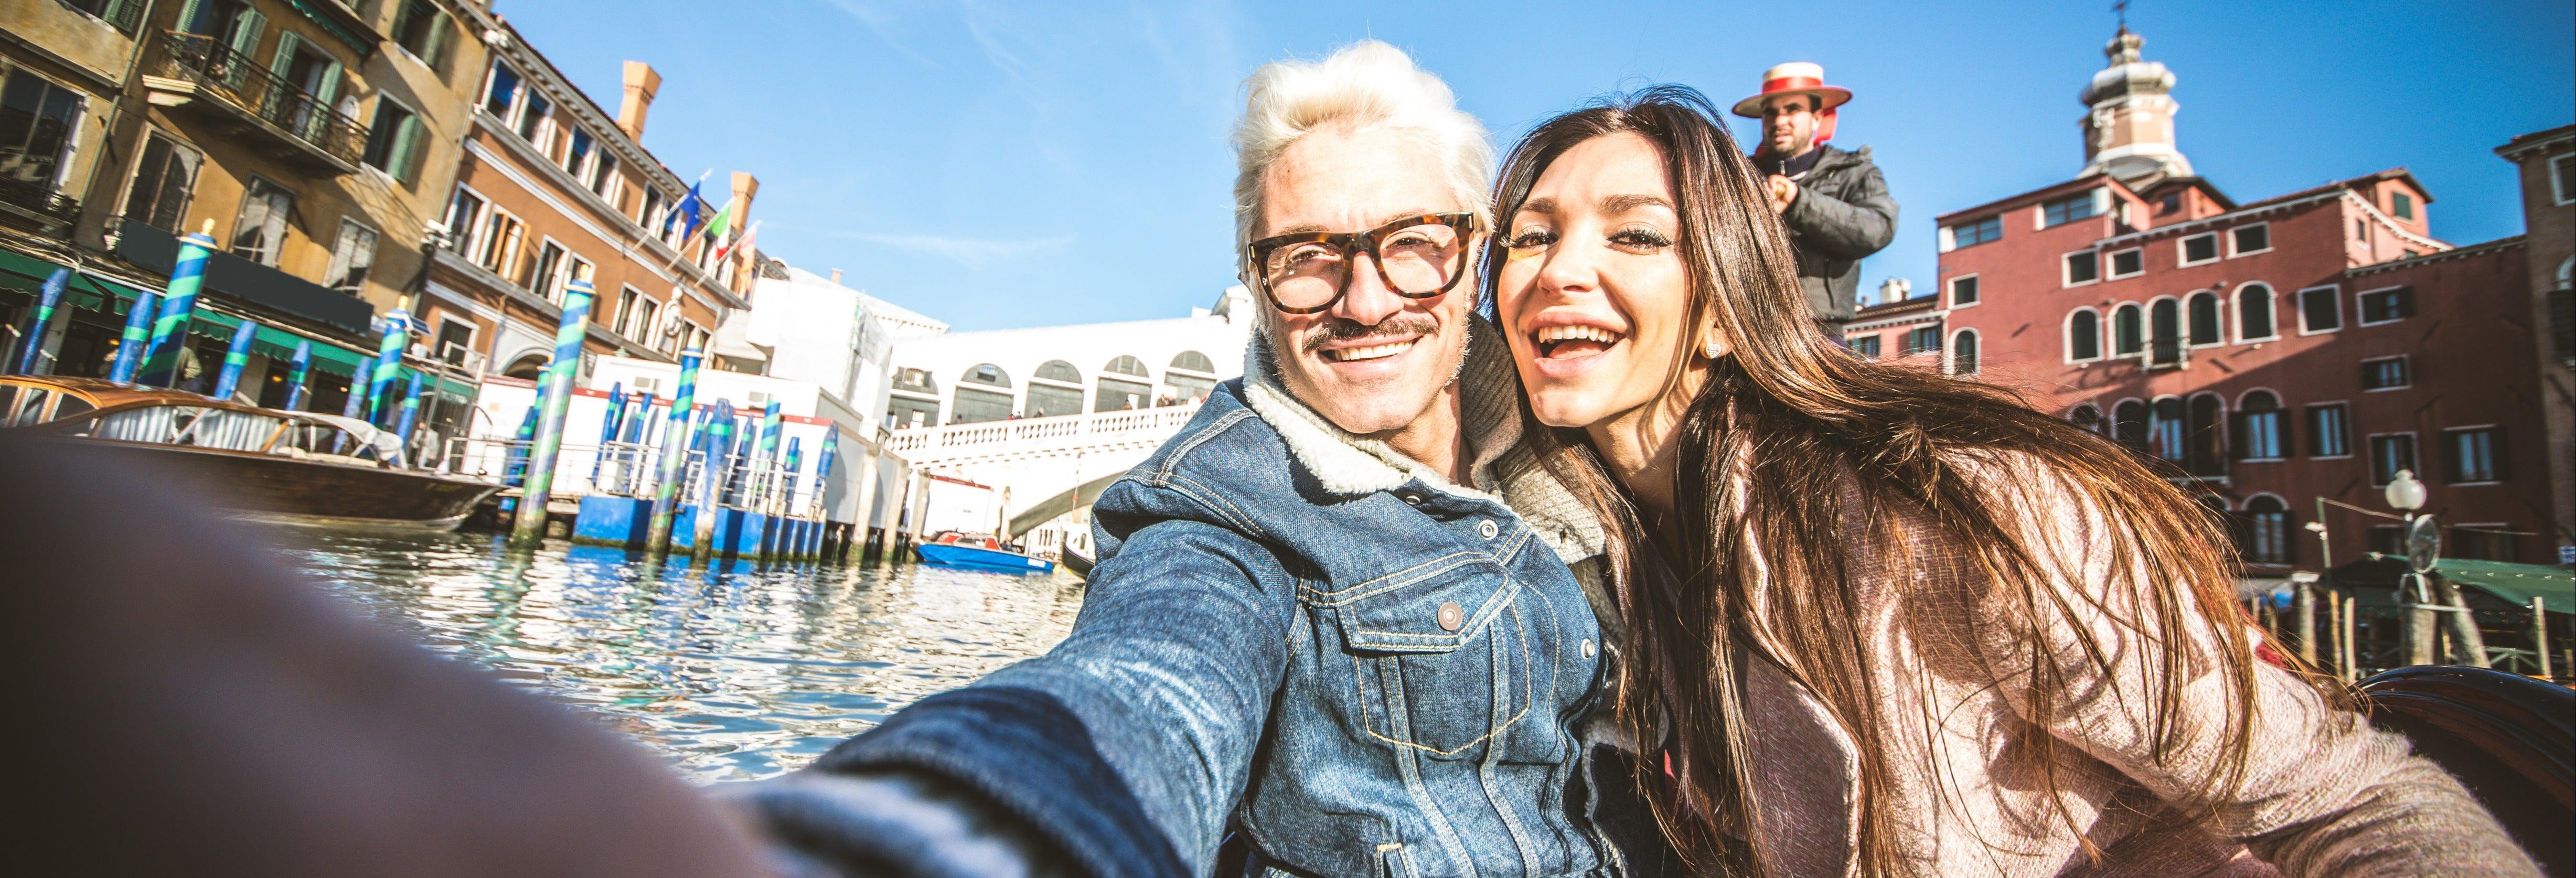 Tour privado por Venecia con guía en español